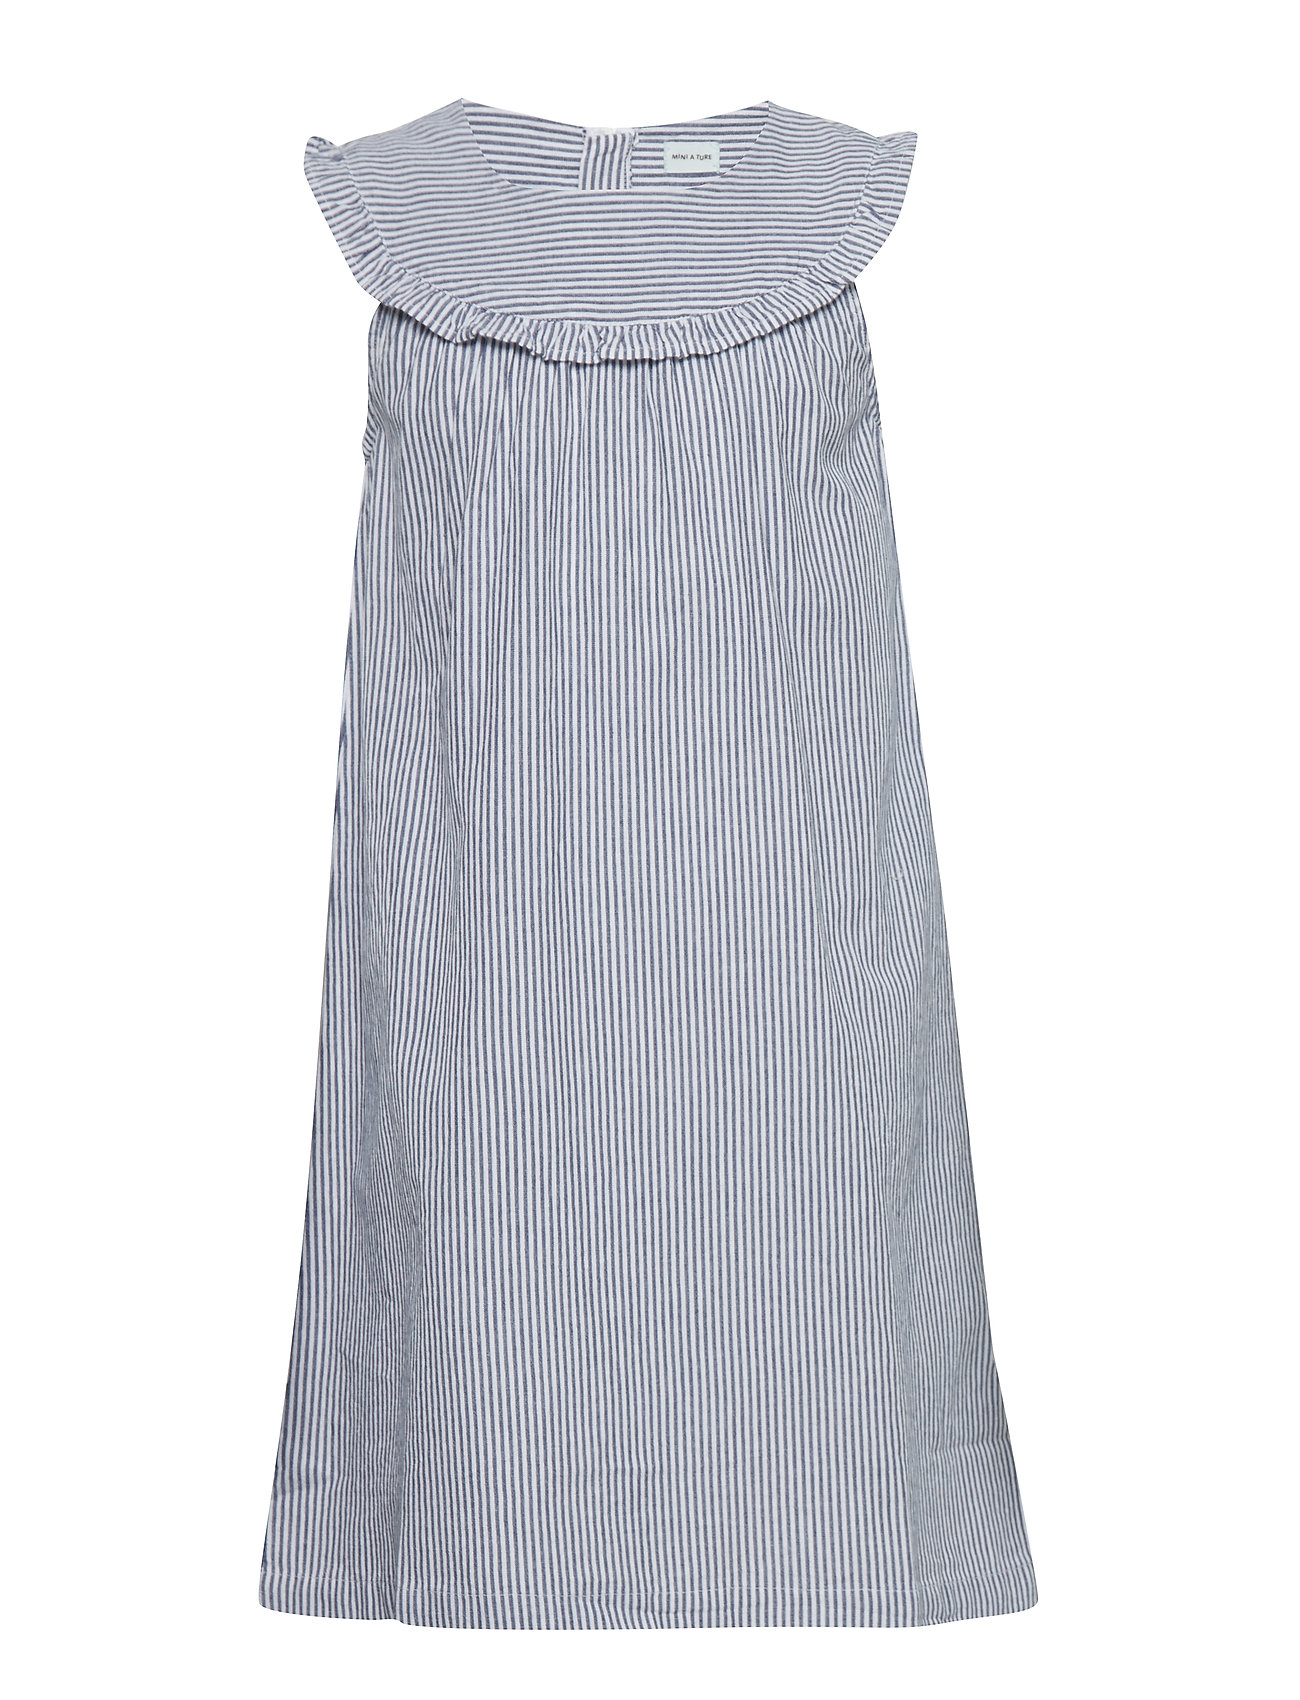 Mini A Ture Stasia Dress, M - BLUE NIGHTS